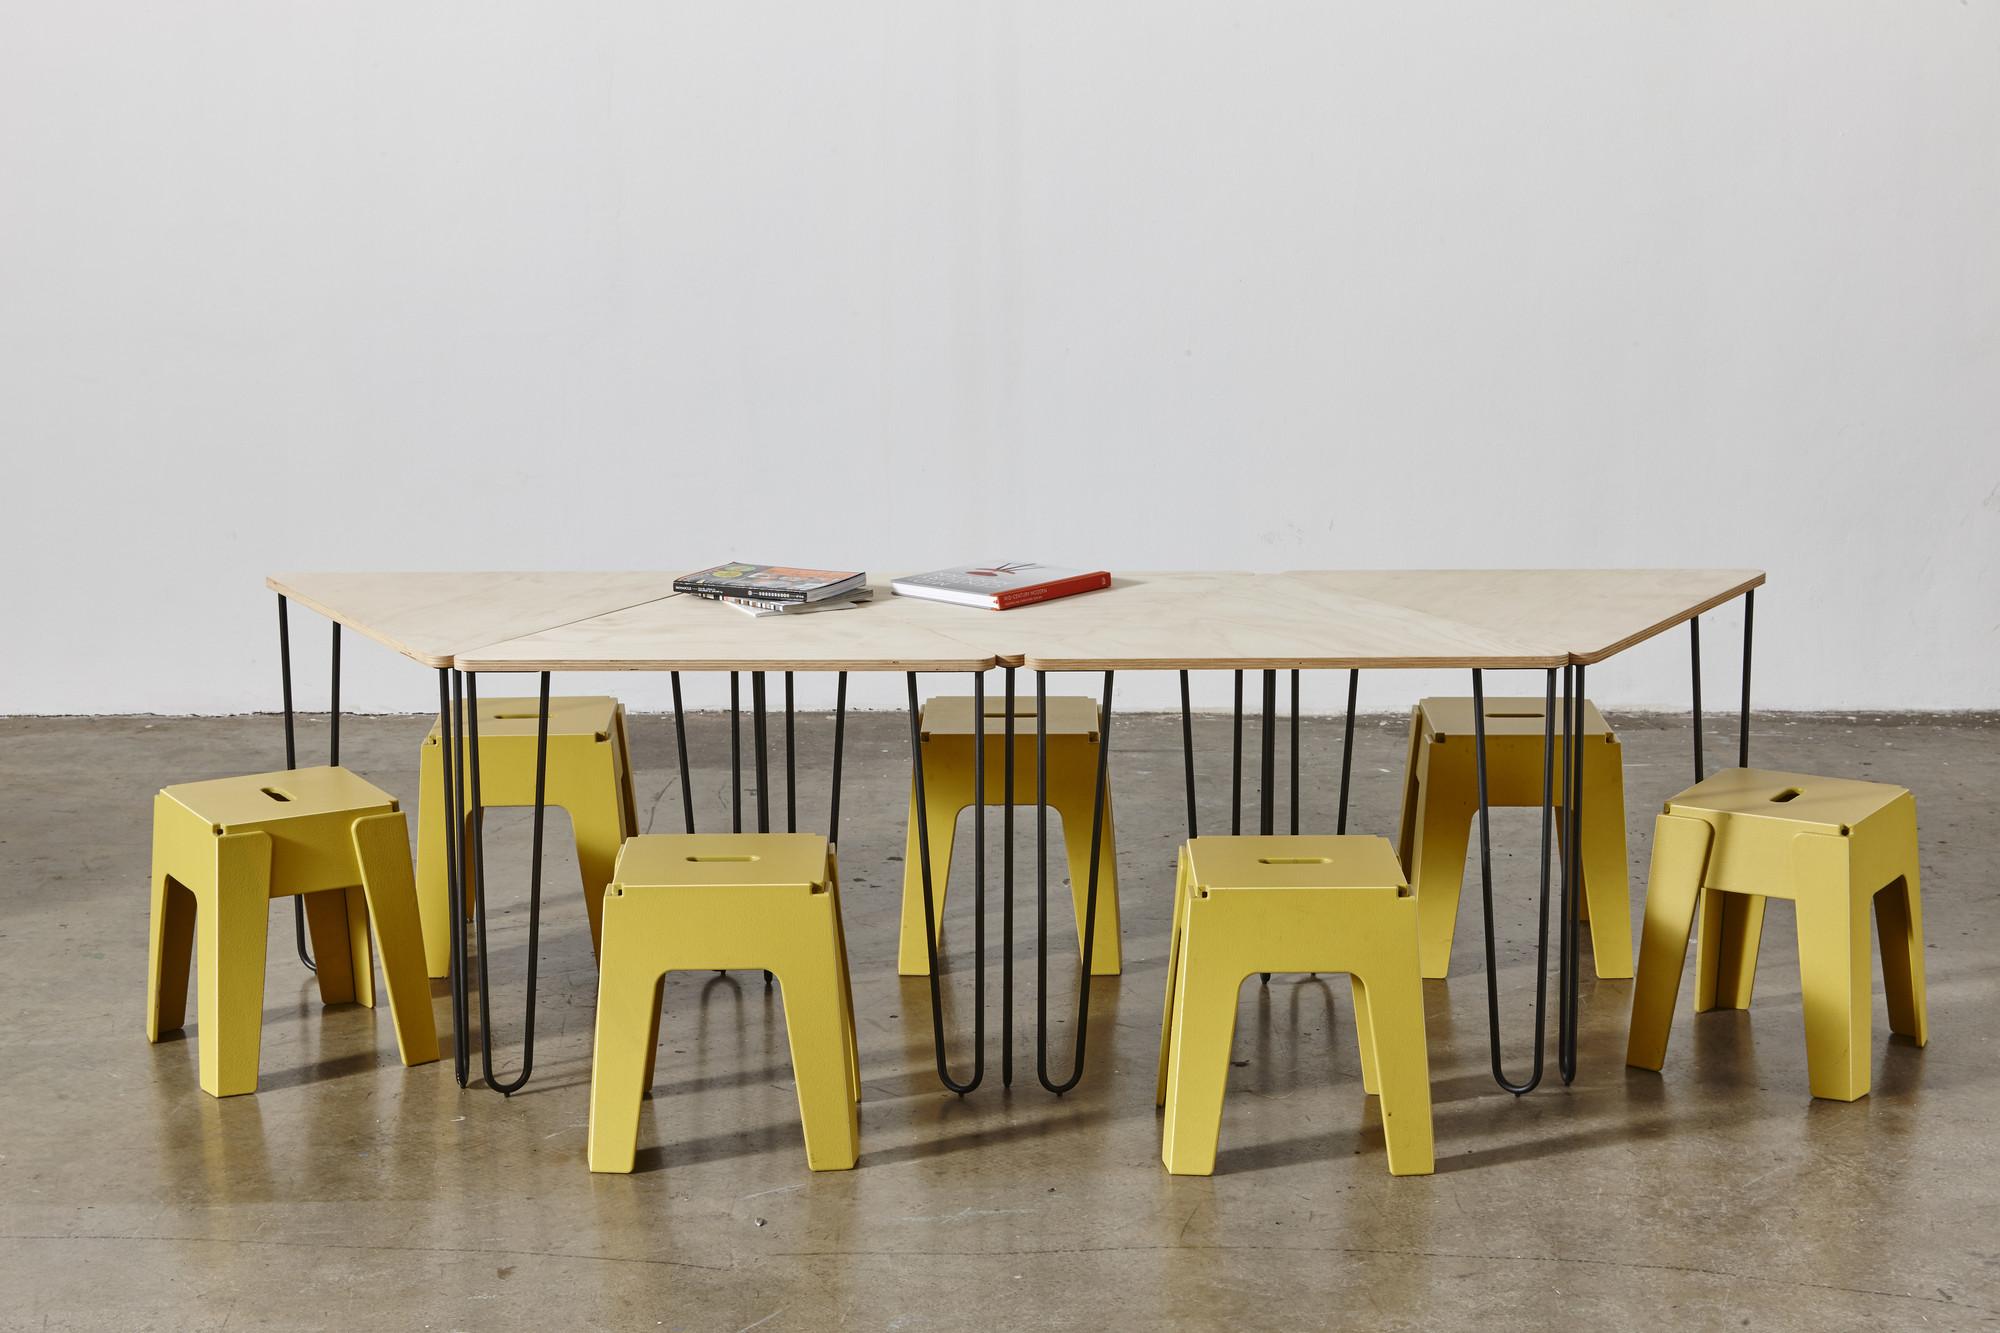 Mesa Fractal / DesignByThem, © Pete Daly